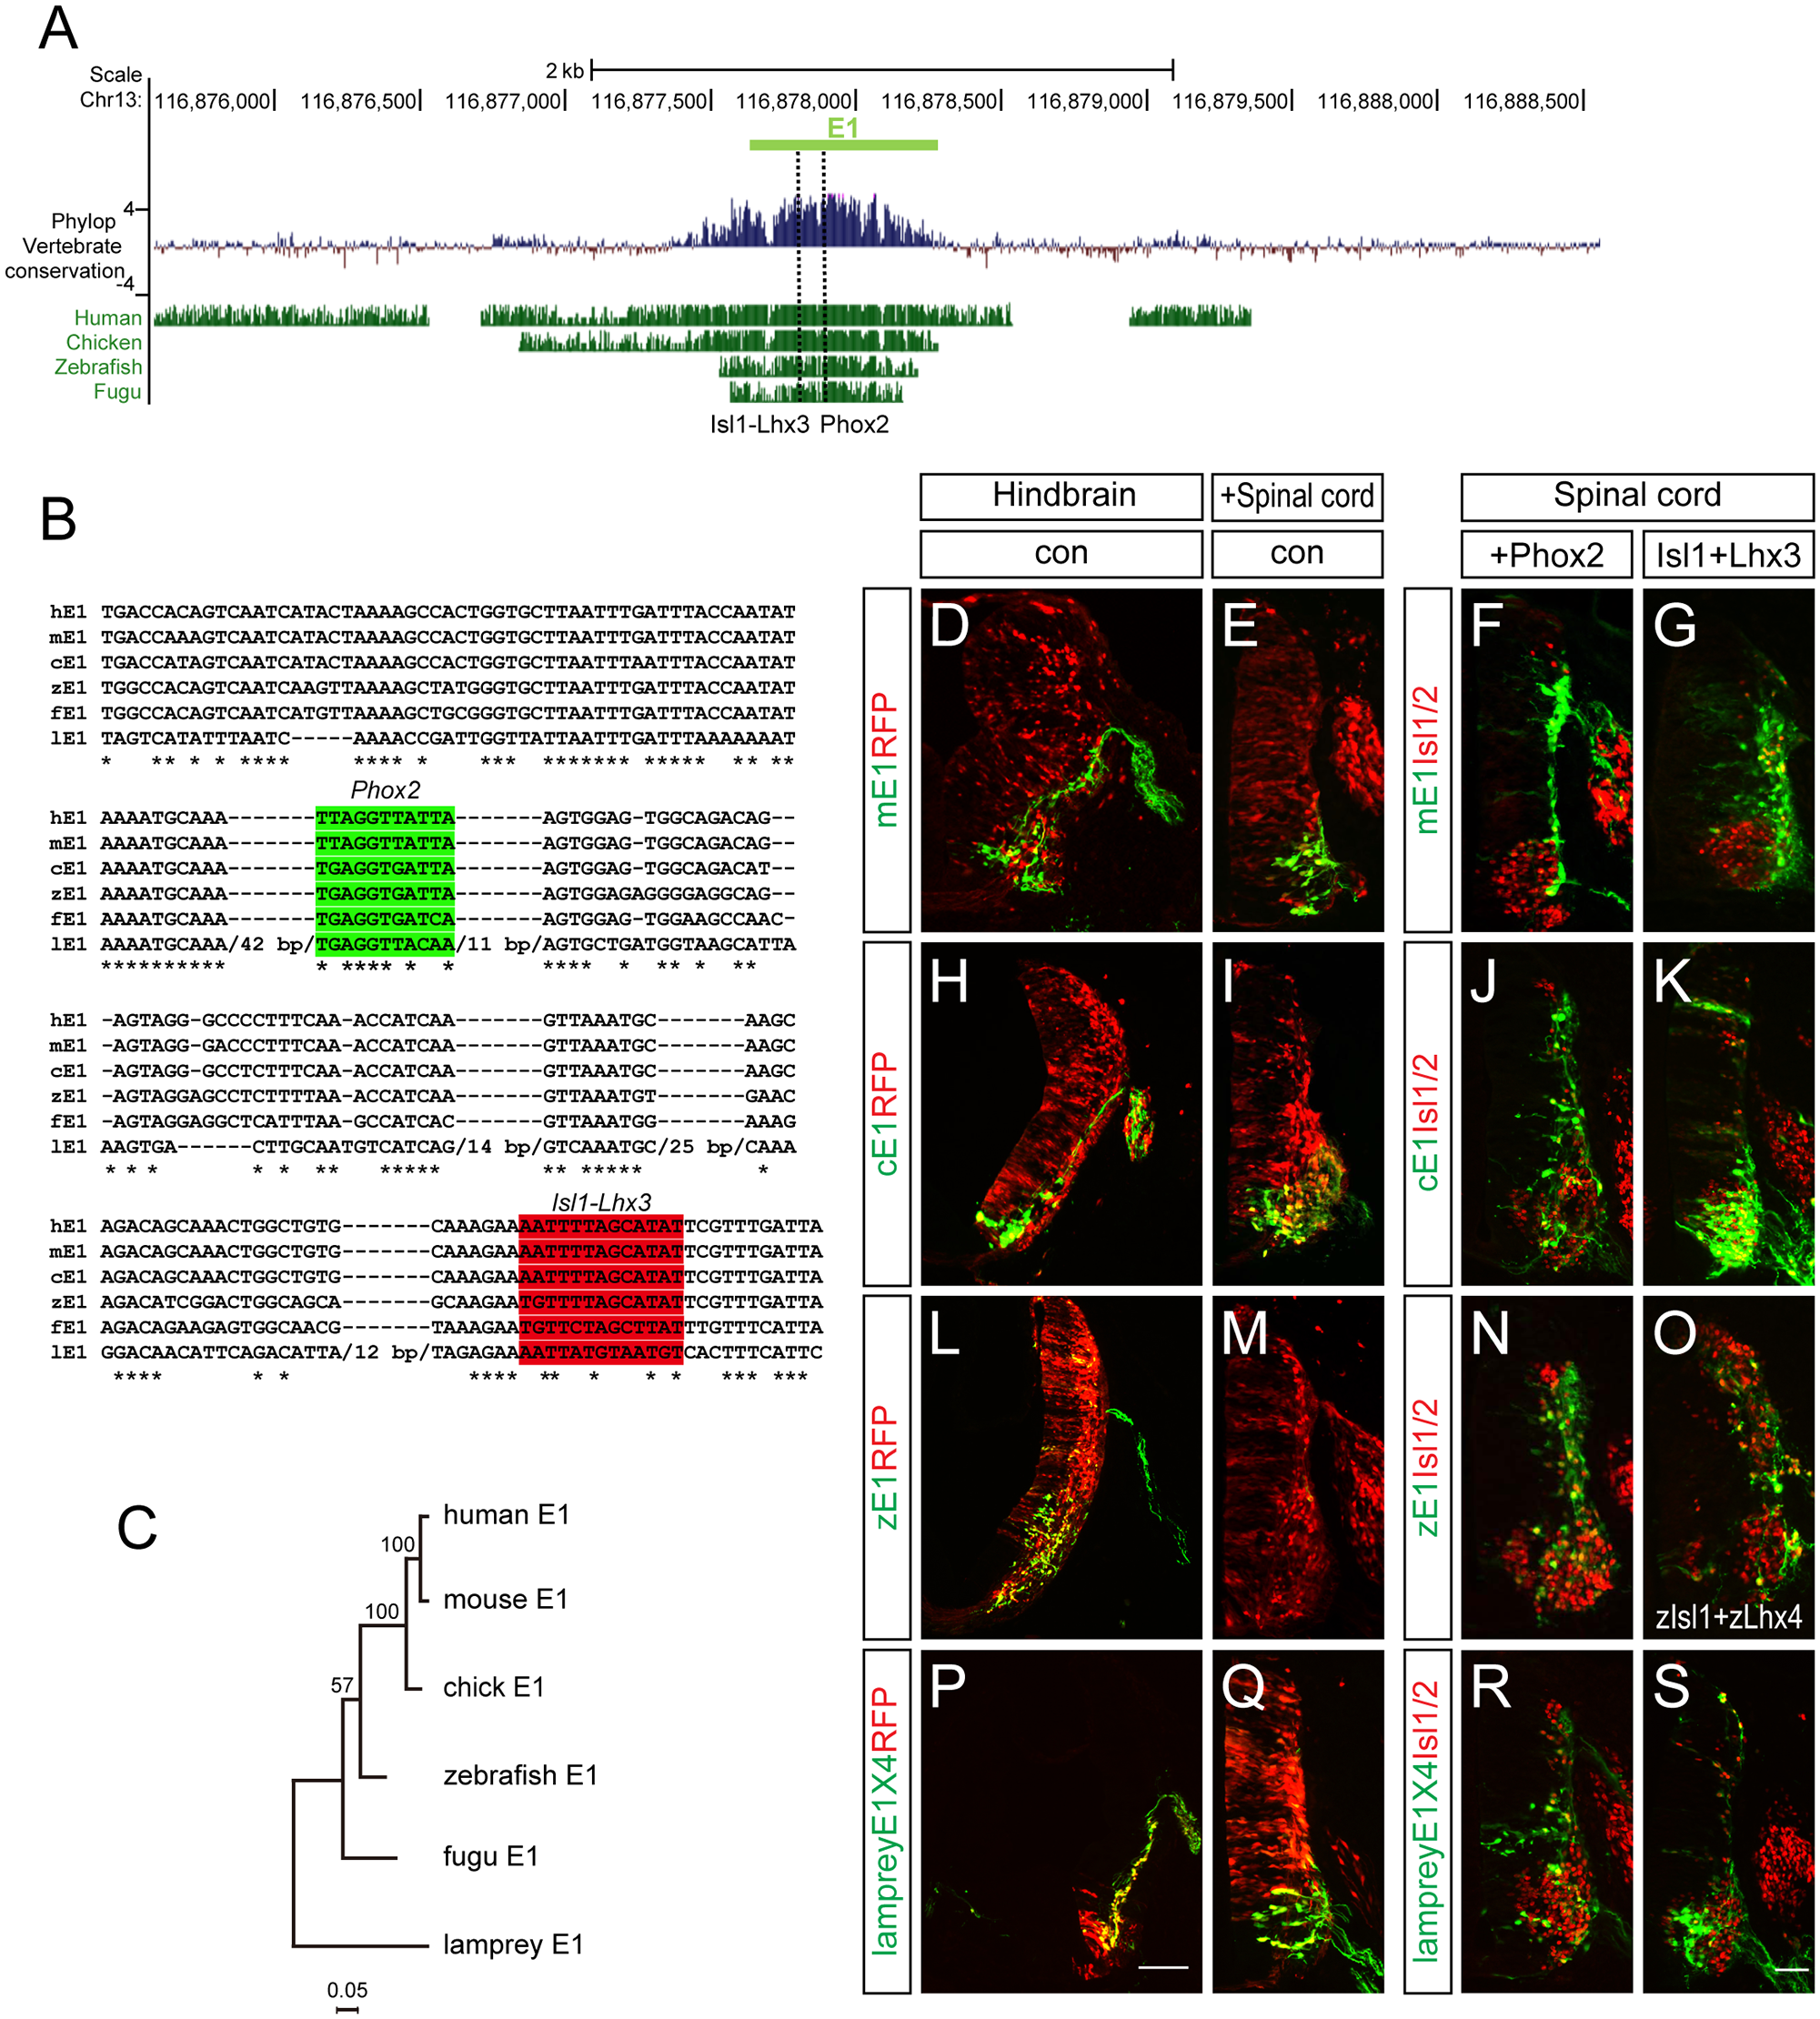 Conservation of putative regulatory elements of the E1 enhancer in vertebrates.